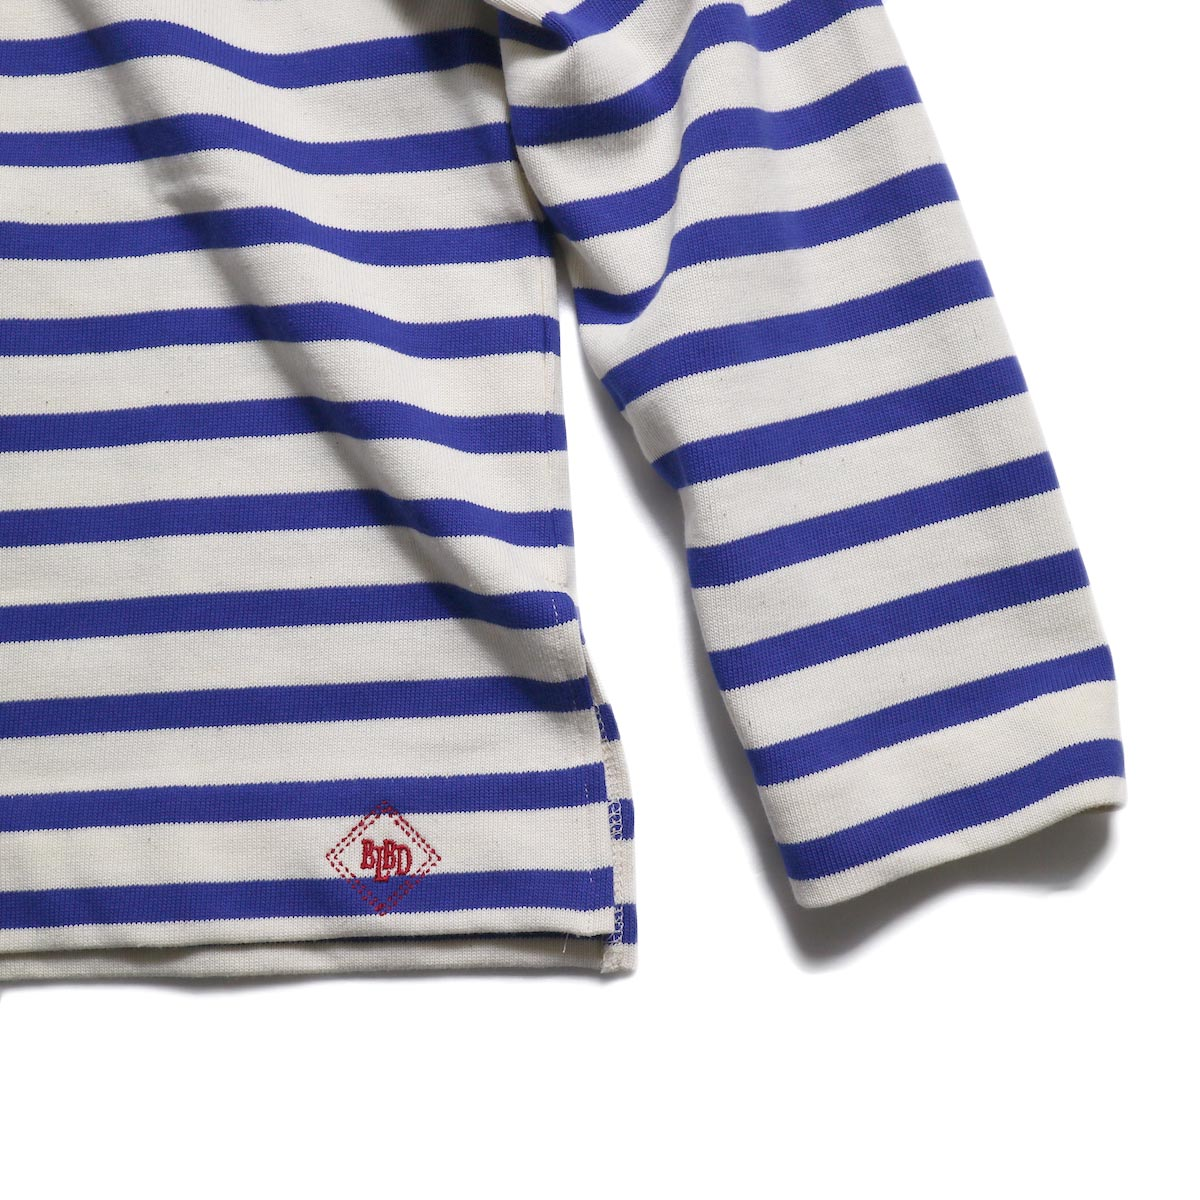 BLUEBIRD BOULEVARD / ボーダーカットソー (Blue) 裾